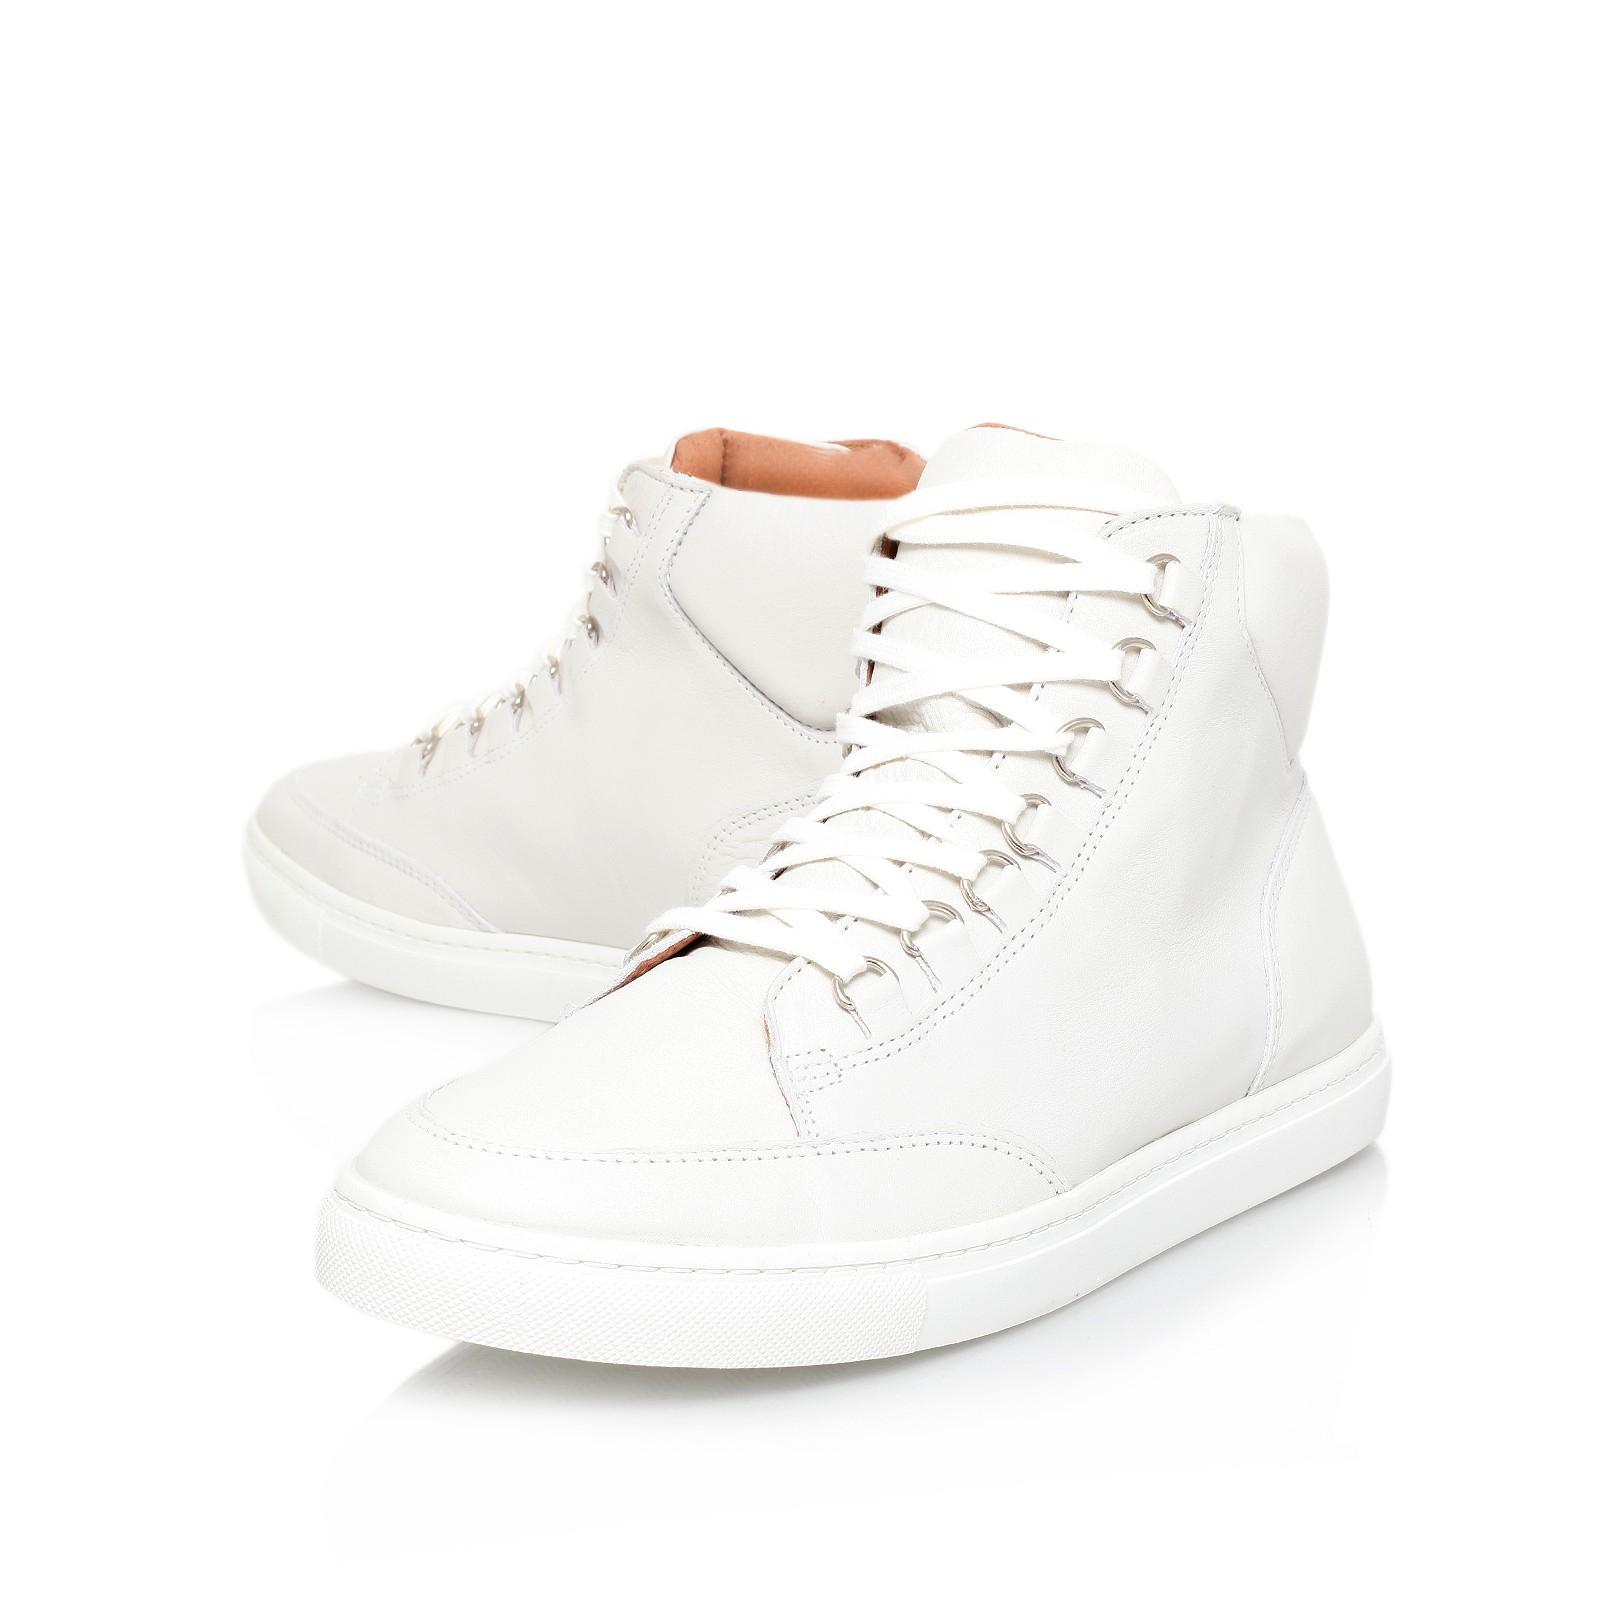 Bricker S Shoes Uk